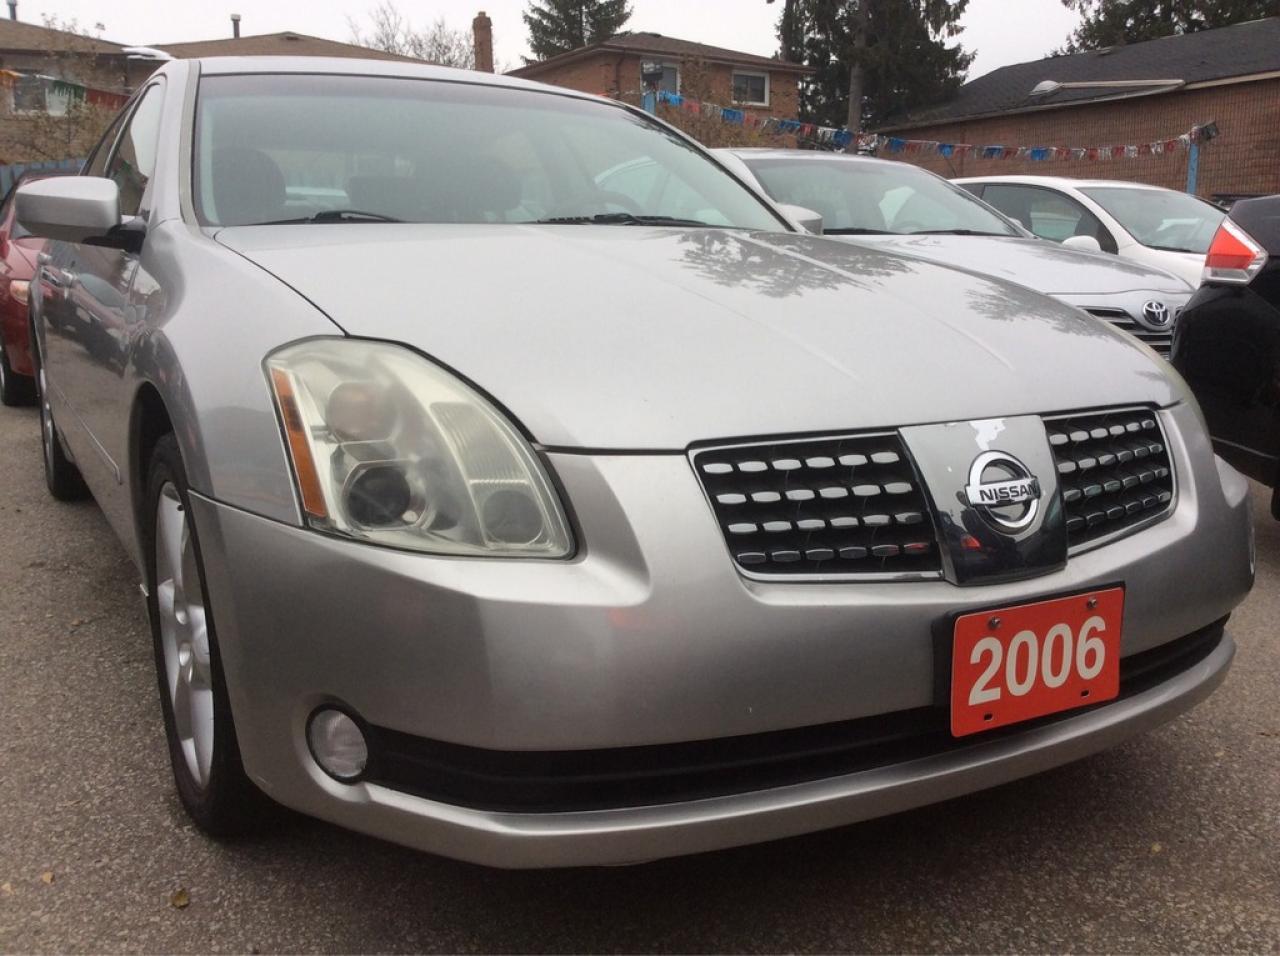 2006 Nissan Maxima Low KM 101K Leather Sunroof Bluetooth Alloys MINT